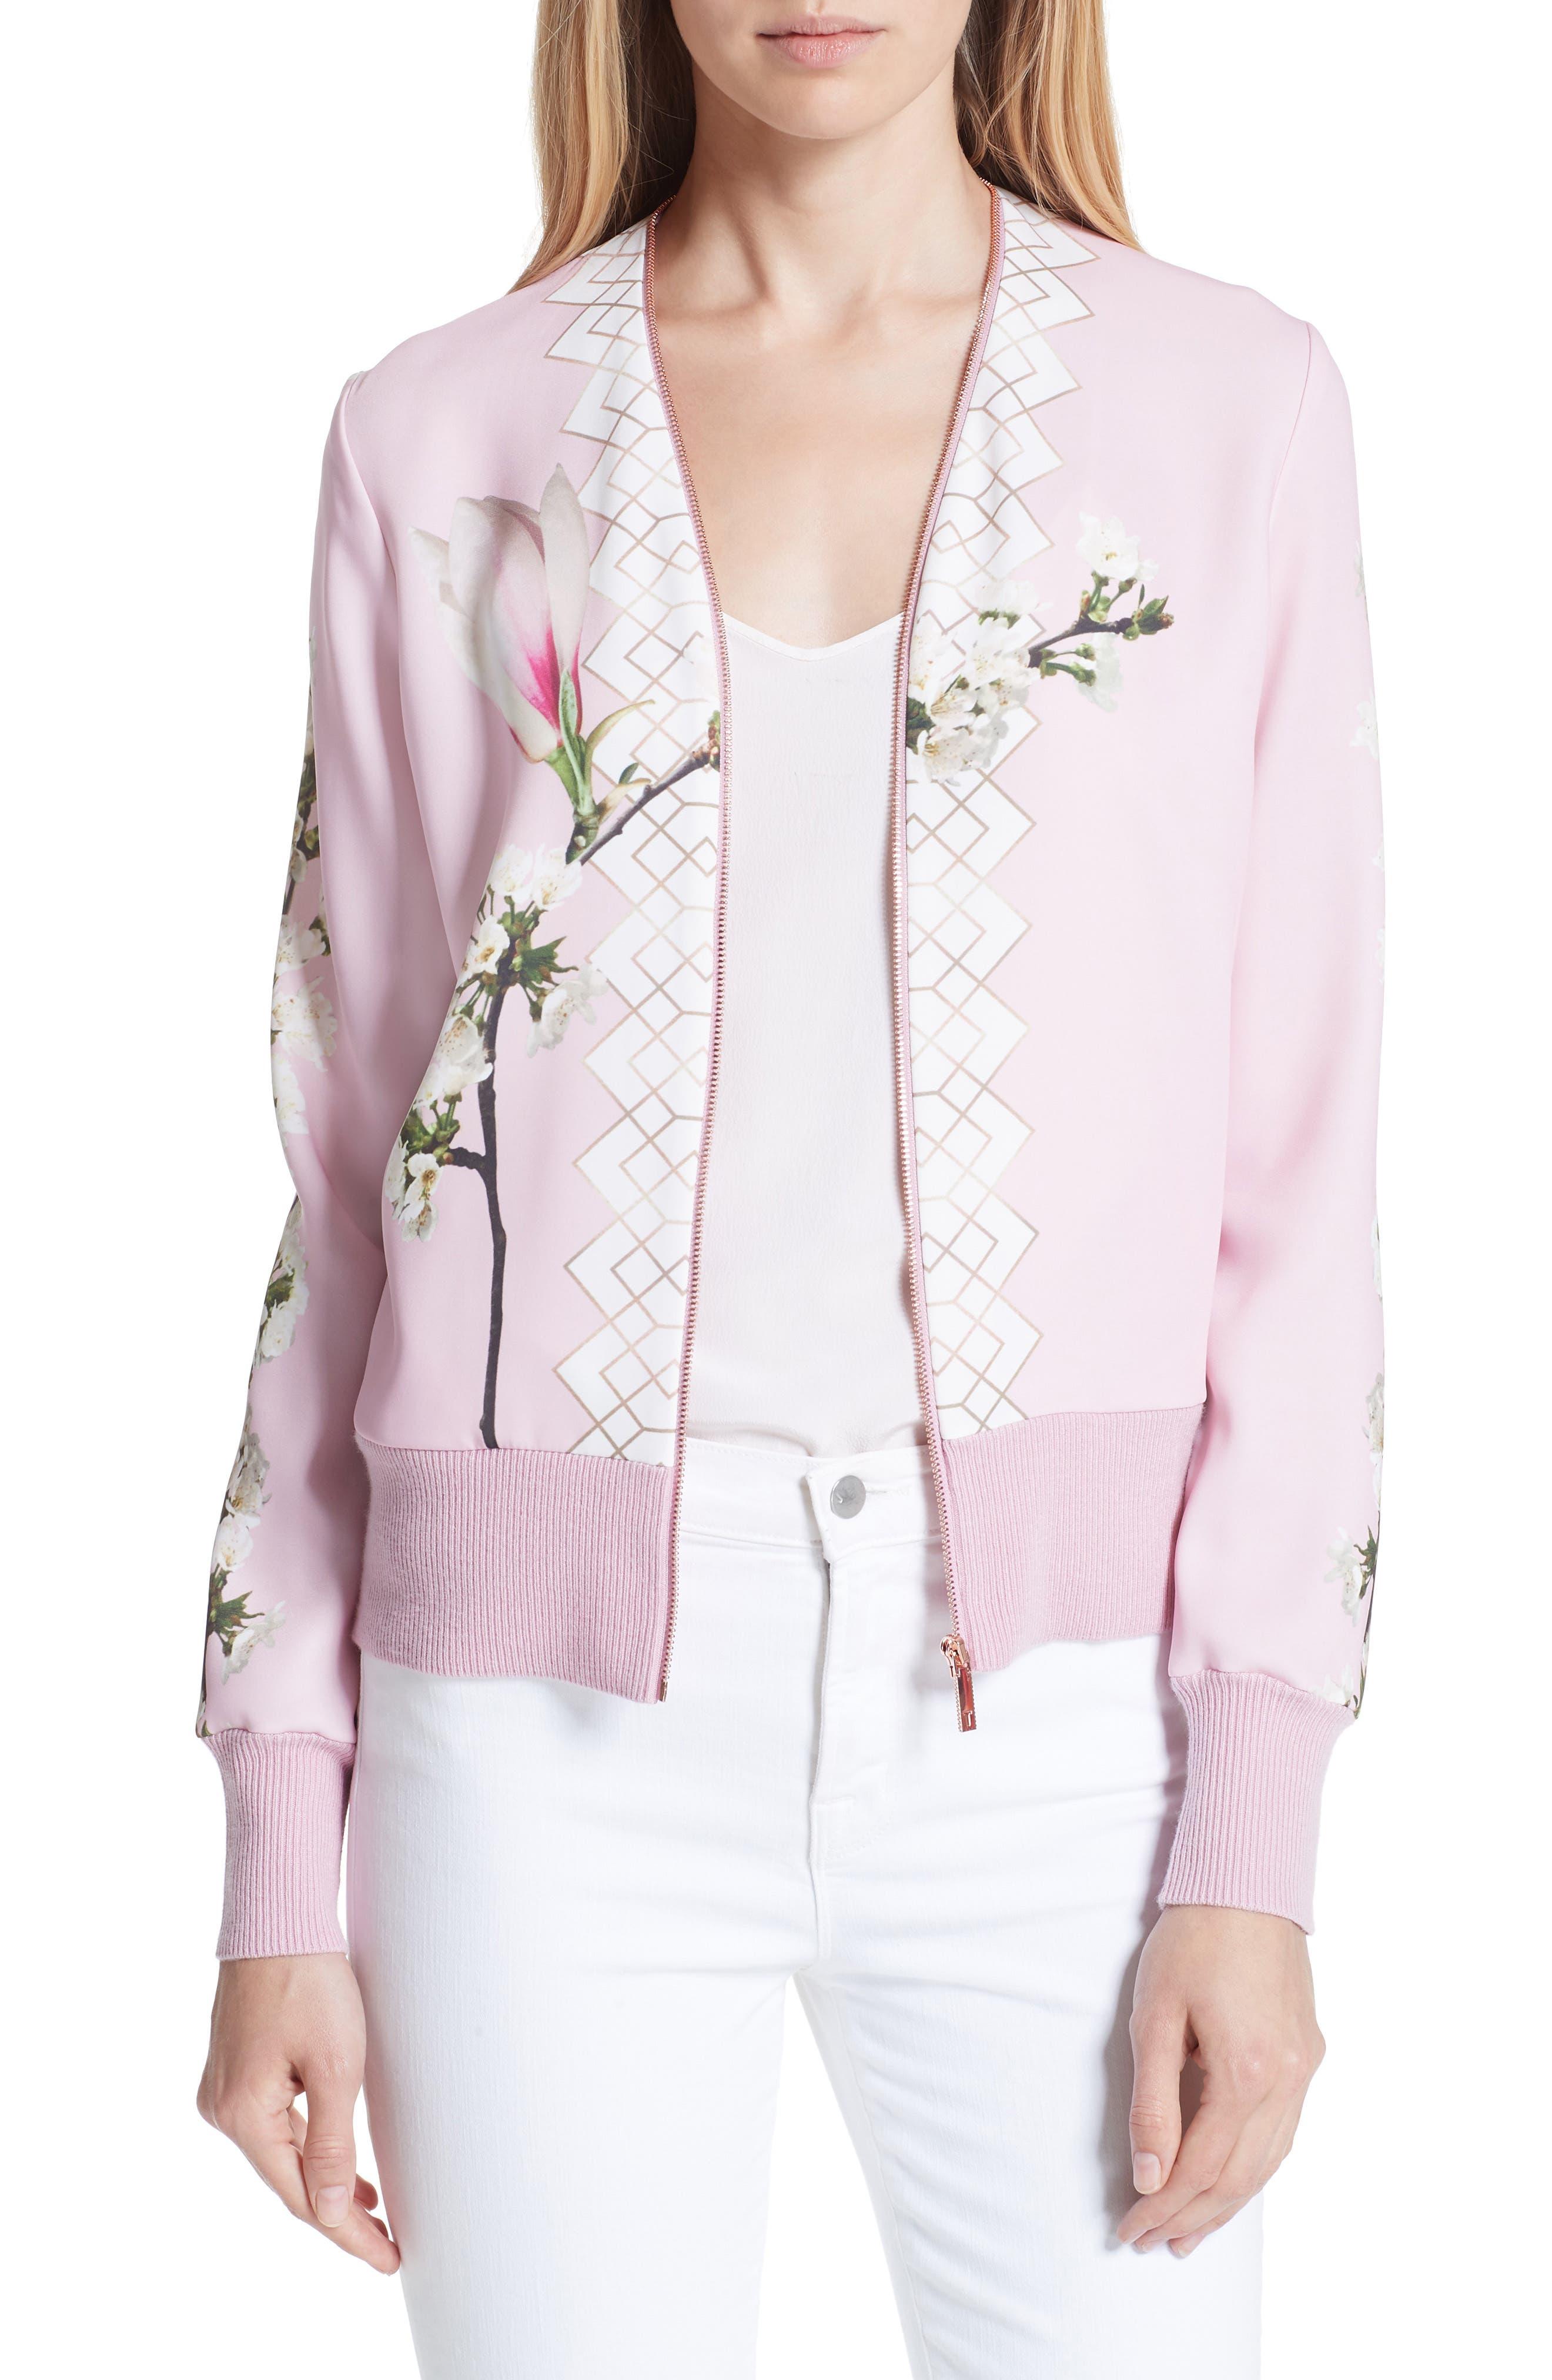 Emylou Harmony Bomber Jacket,                             Main thumbnail 1, color,                             Pale Pink